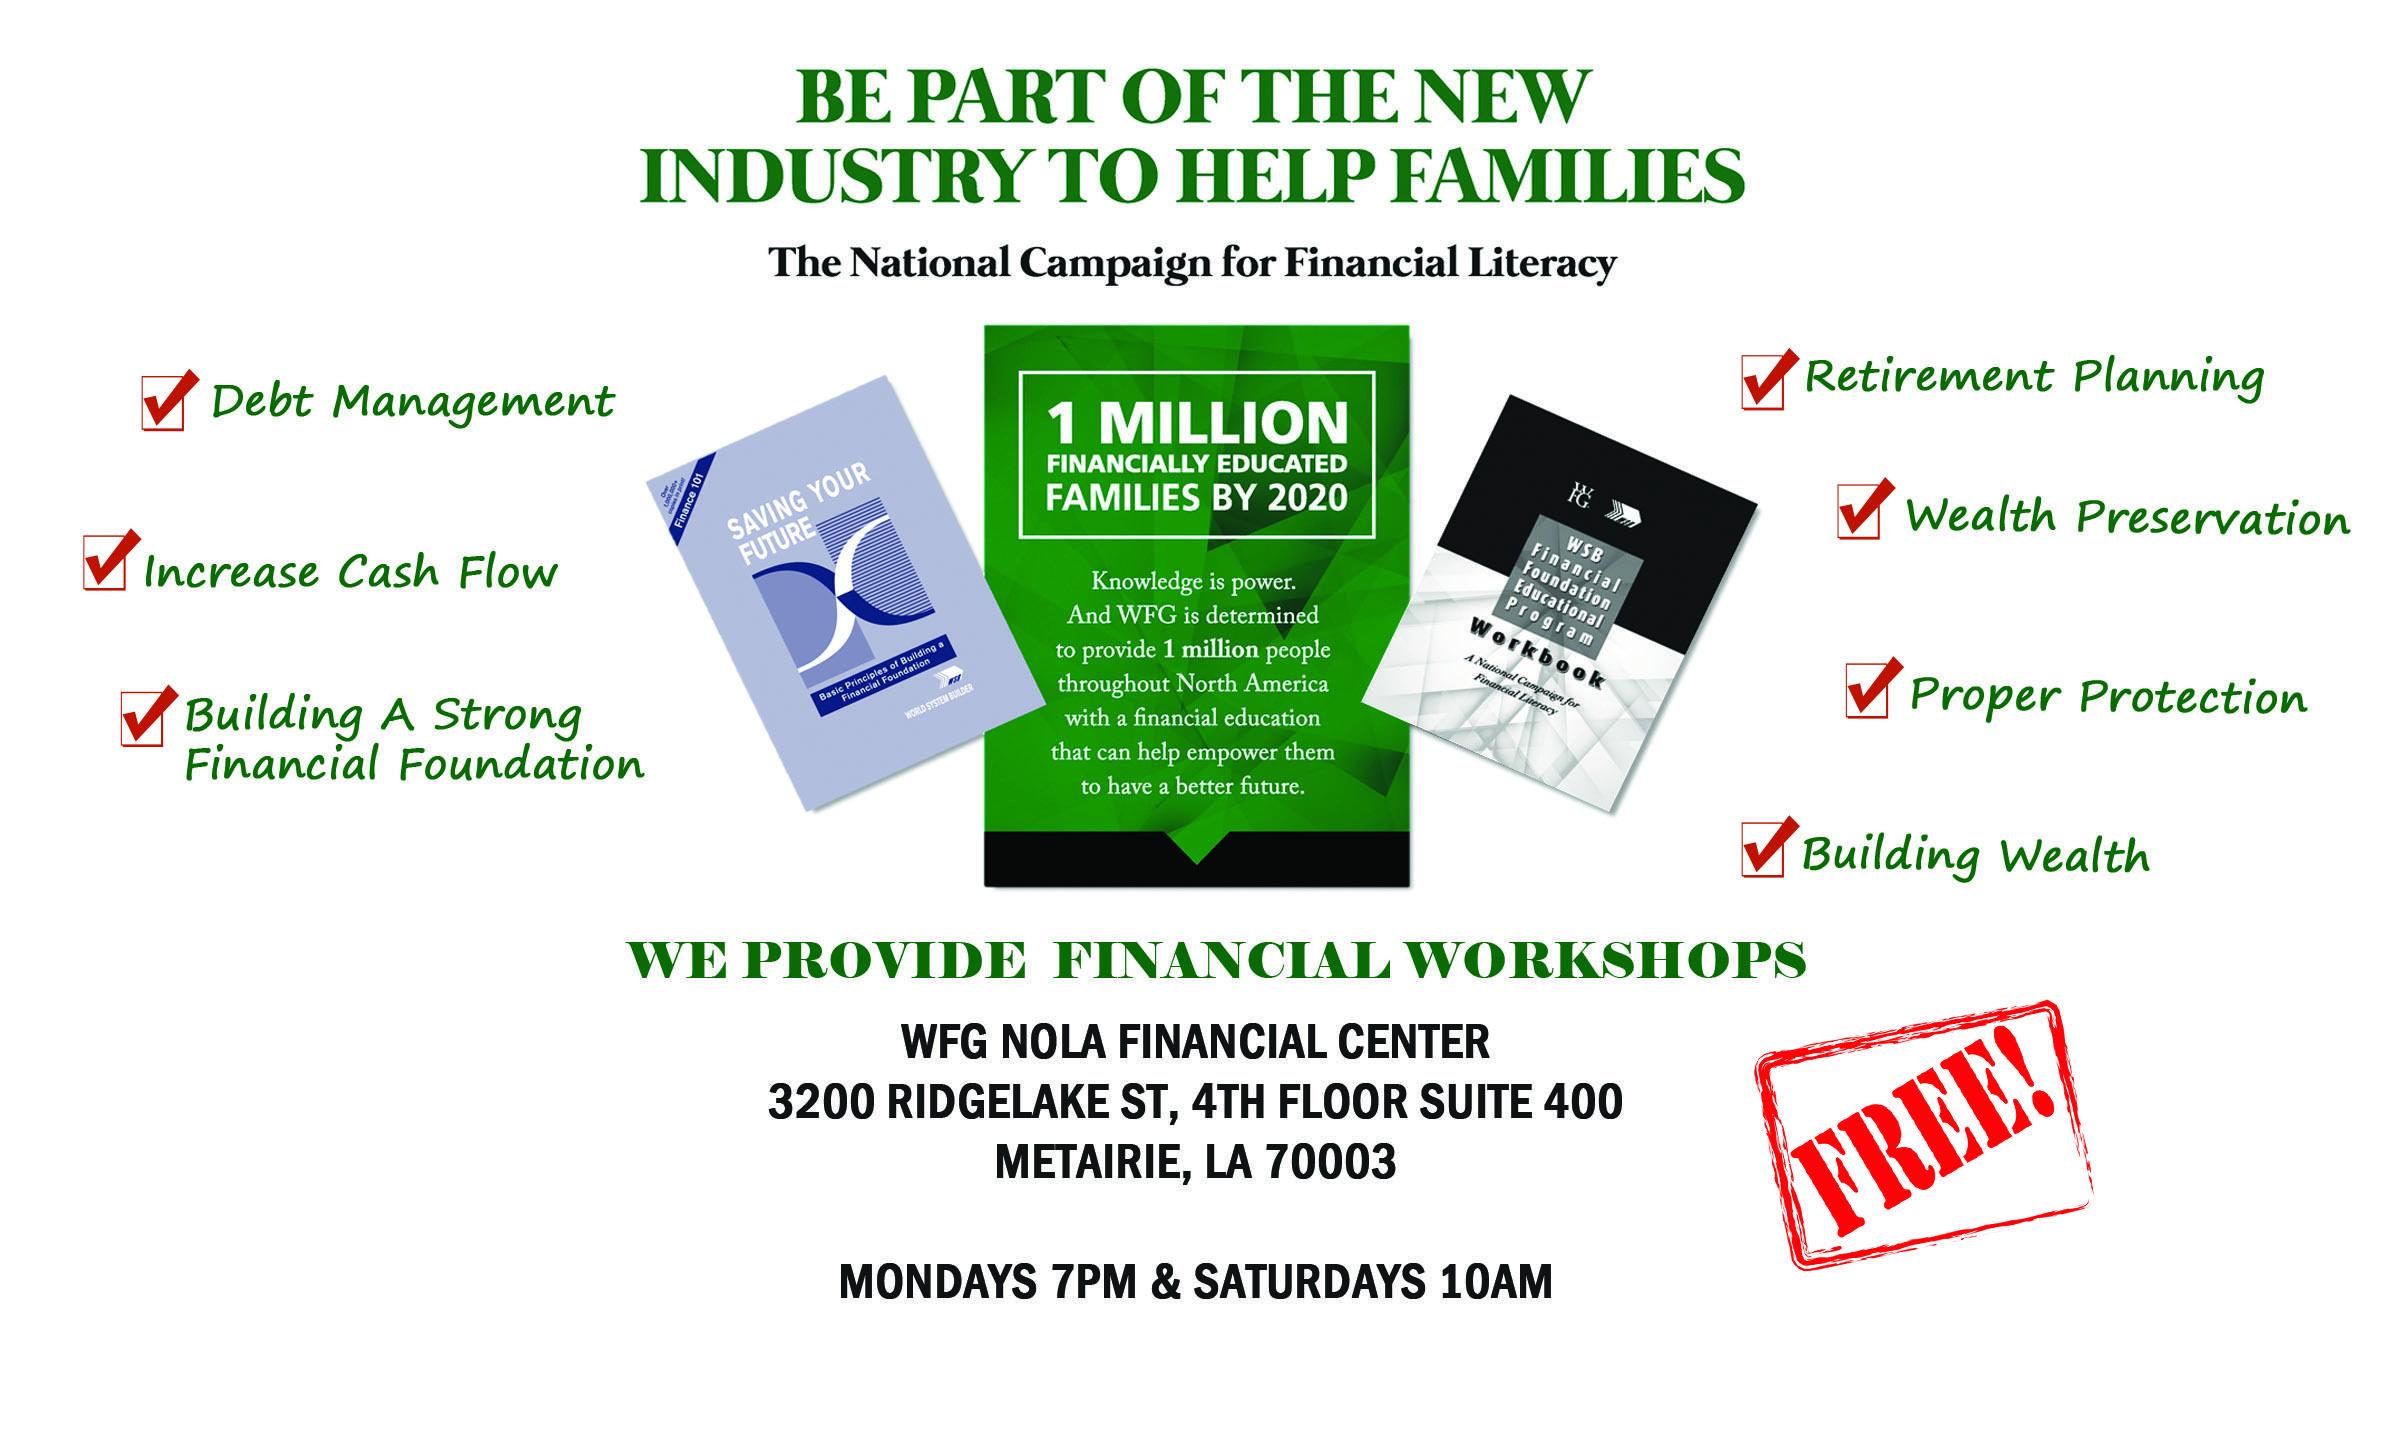 Financial Foundation Educational Workshops